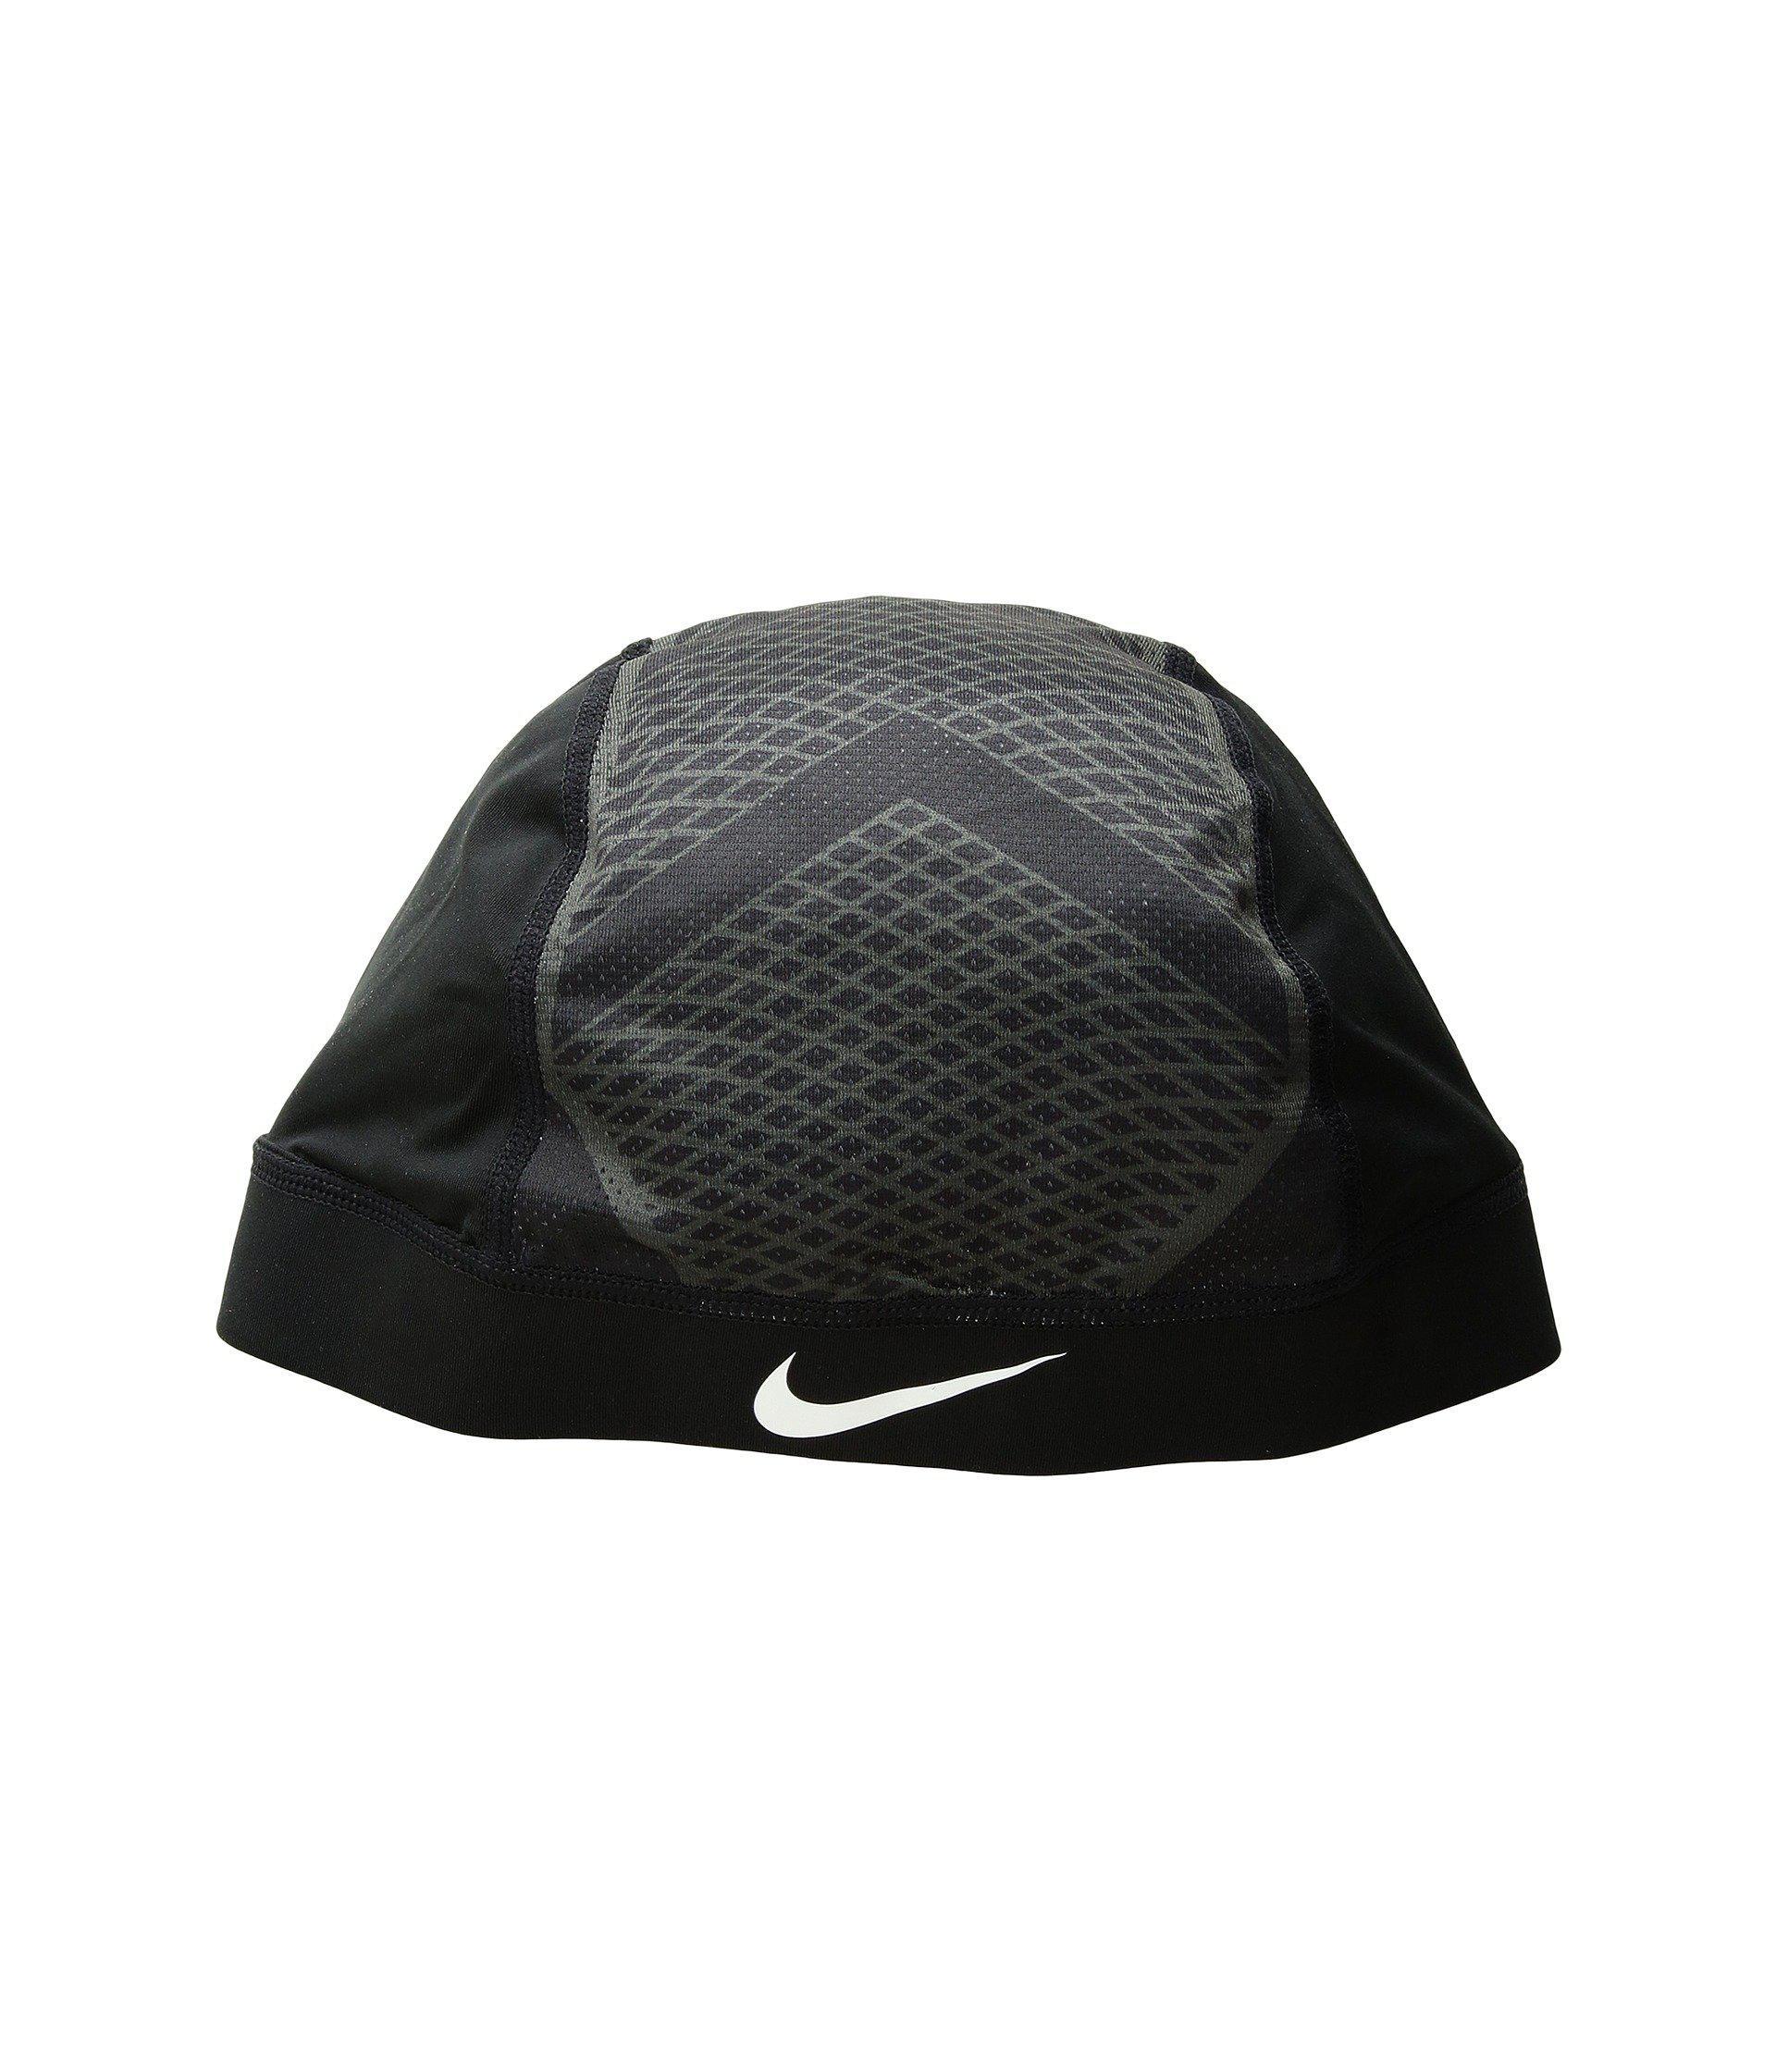 f3de1582c8ad6 Nike Pro Hypercool Vapor Skull Cap 4.0 (black dark Grey white) Caps ...